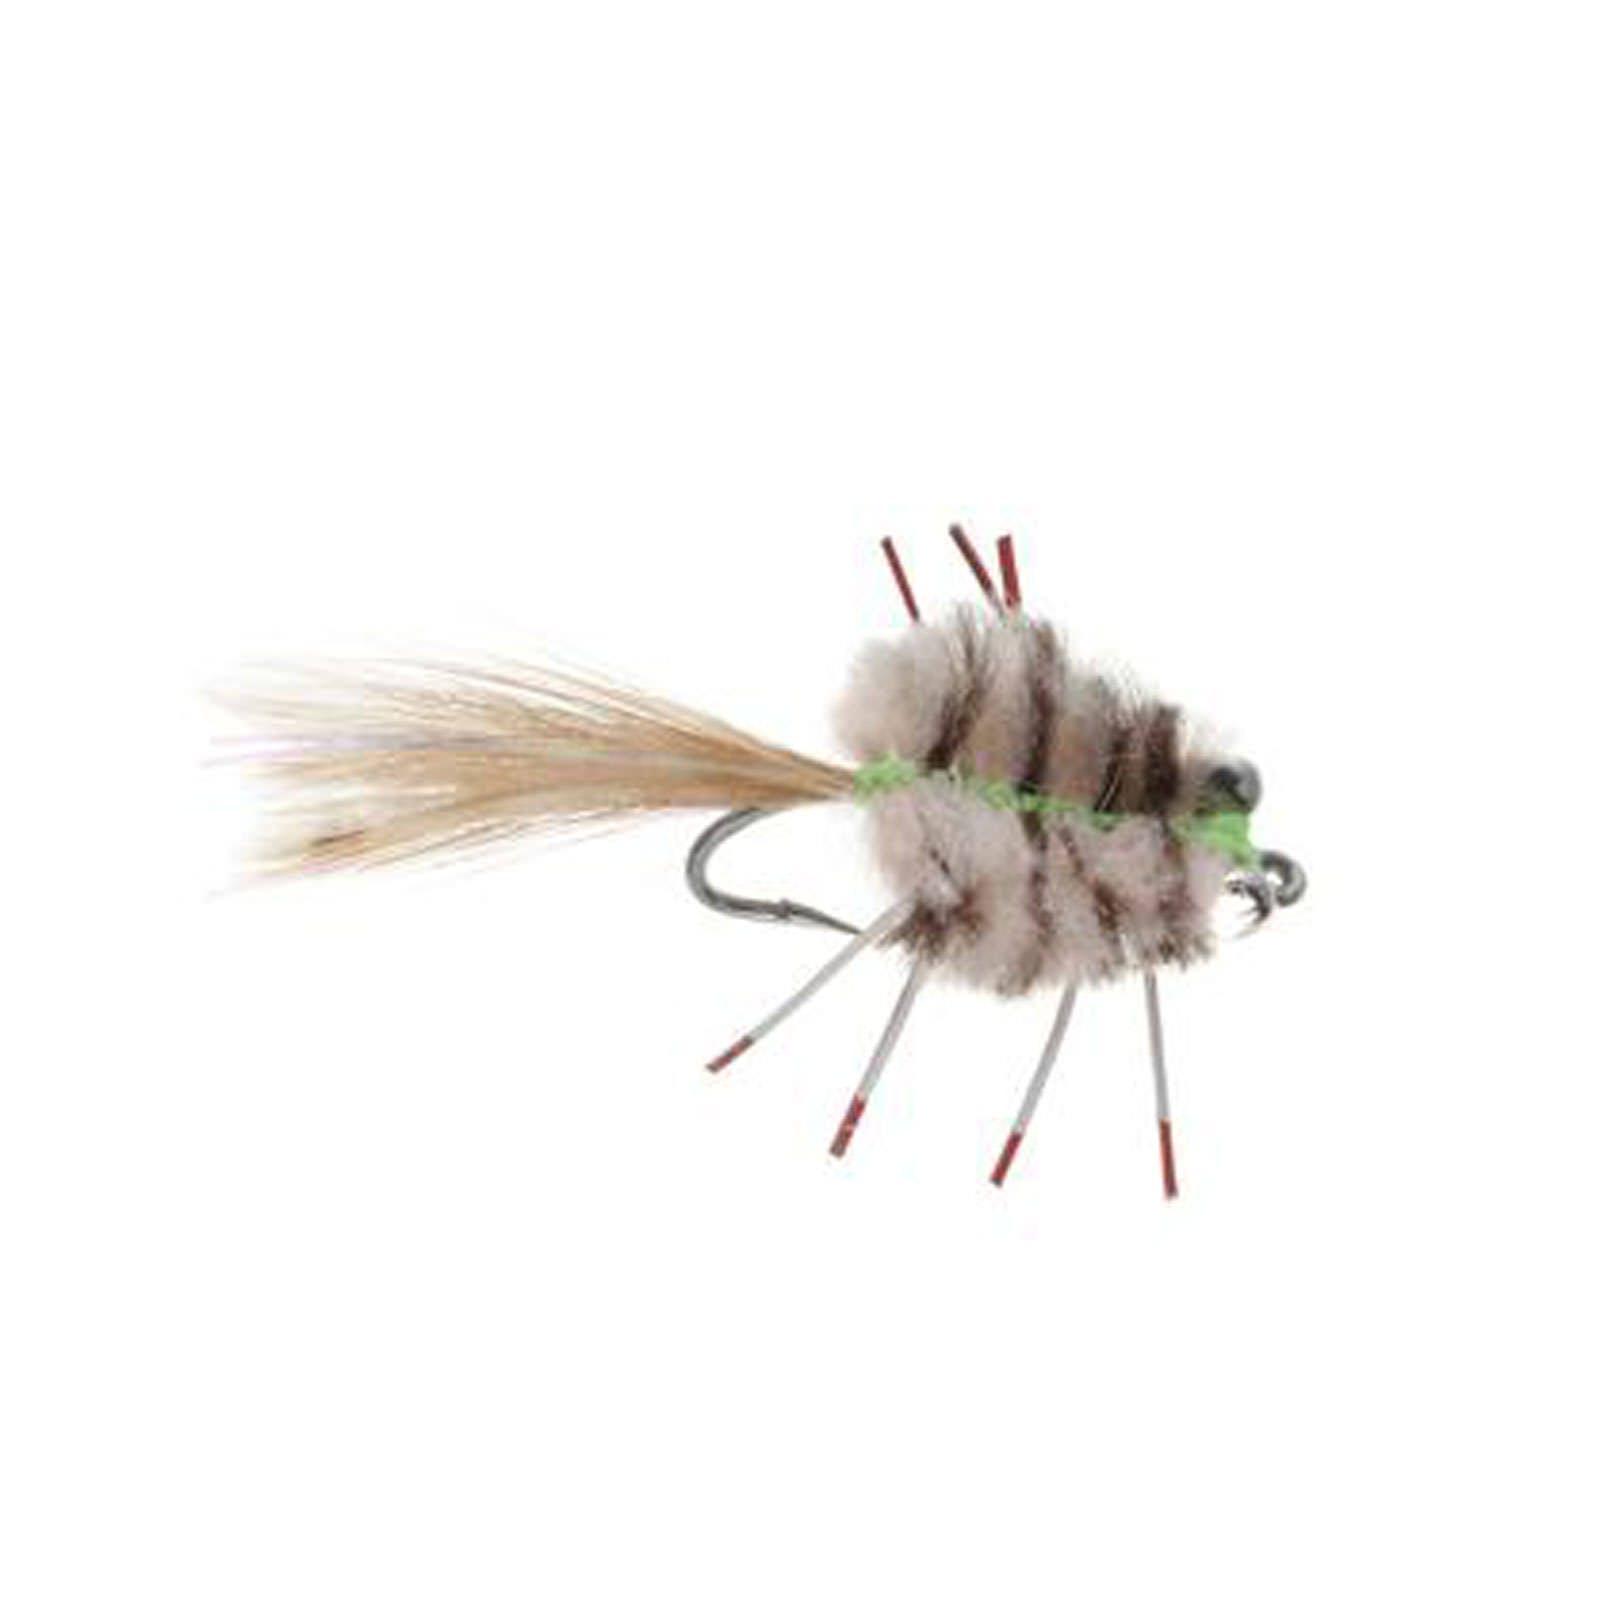 Umpqua Permit Crab Fly Tan/Brown 2